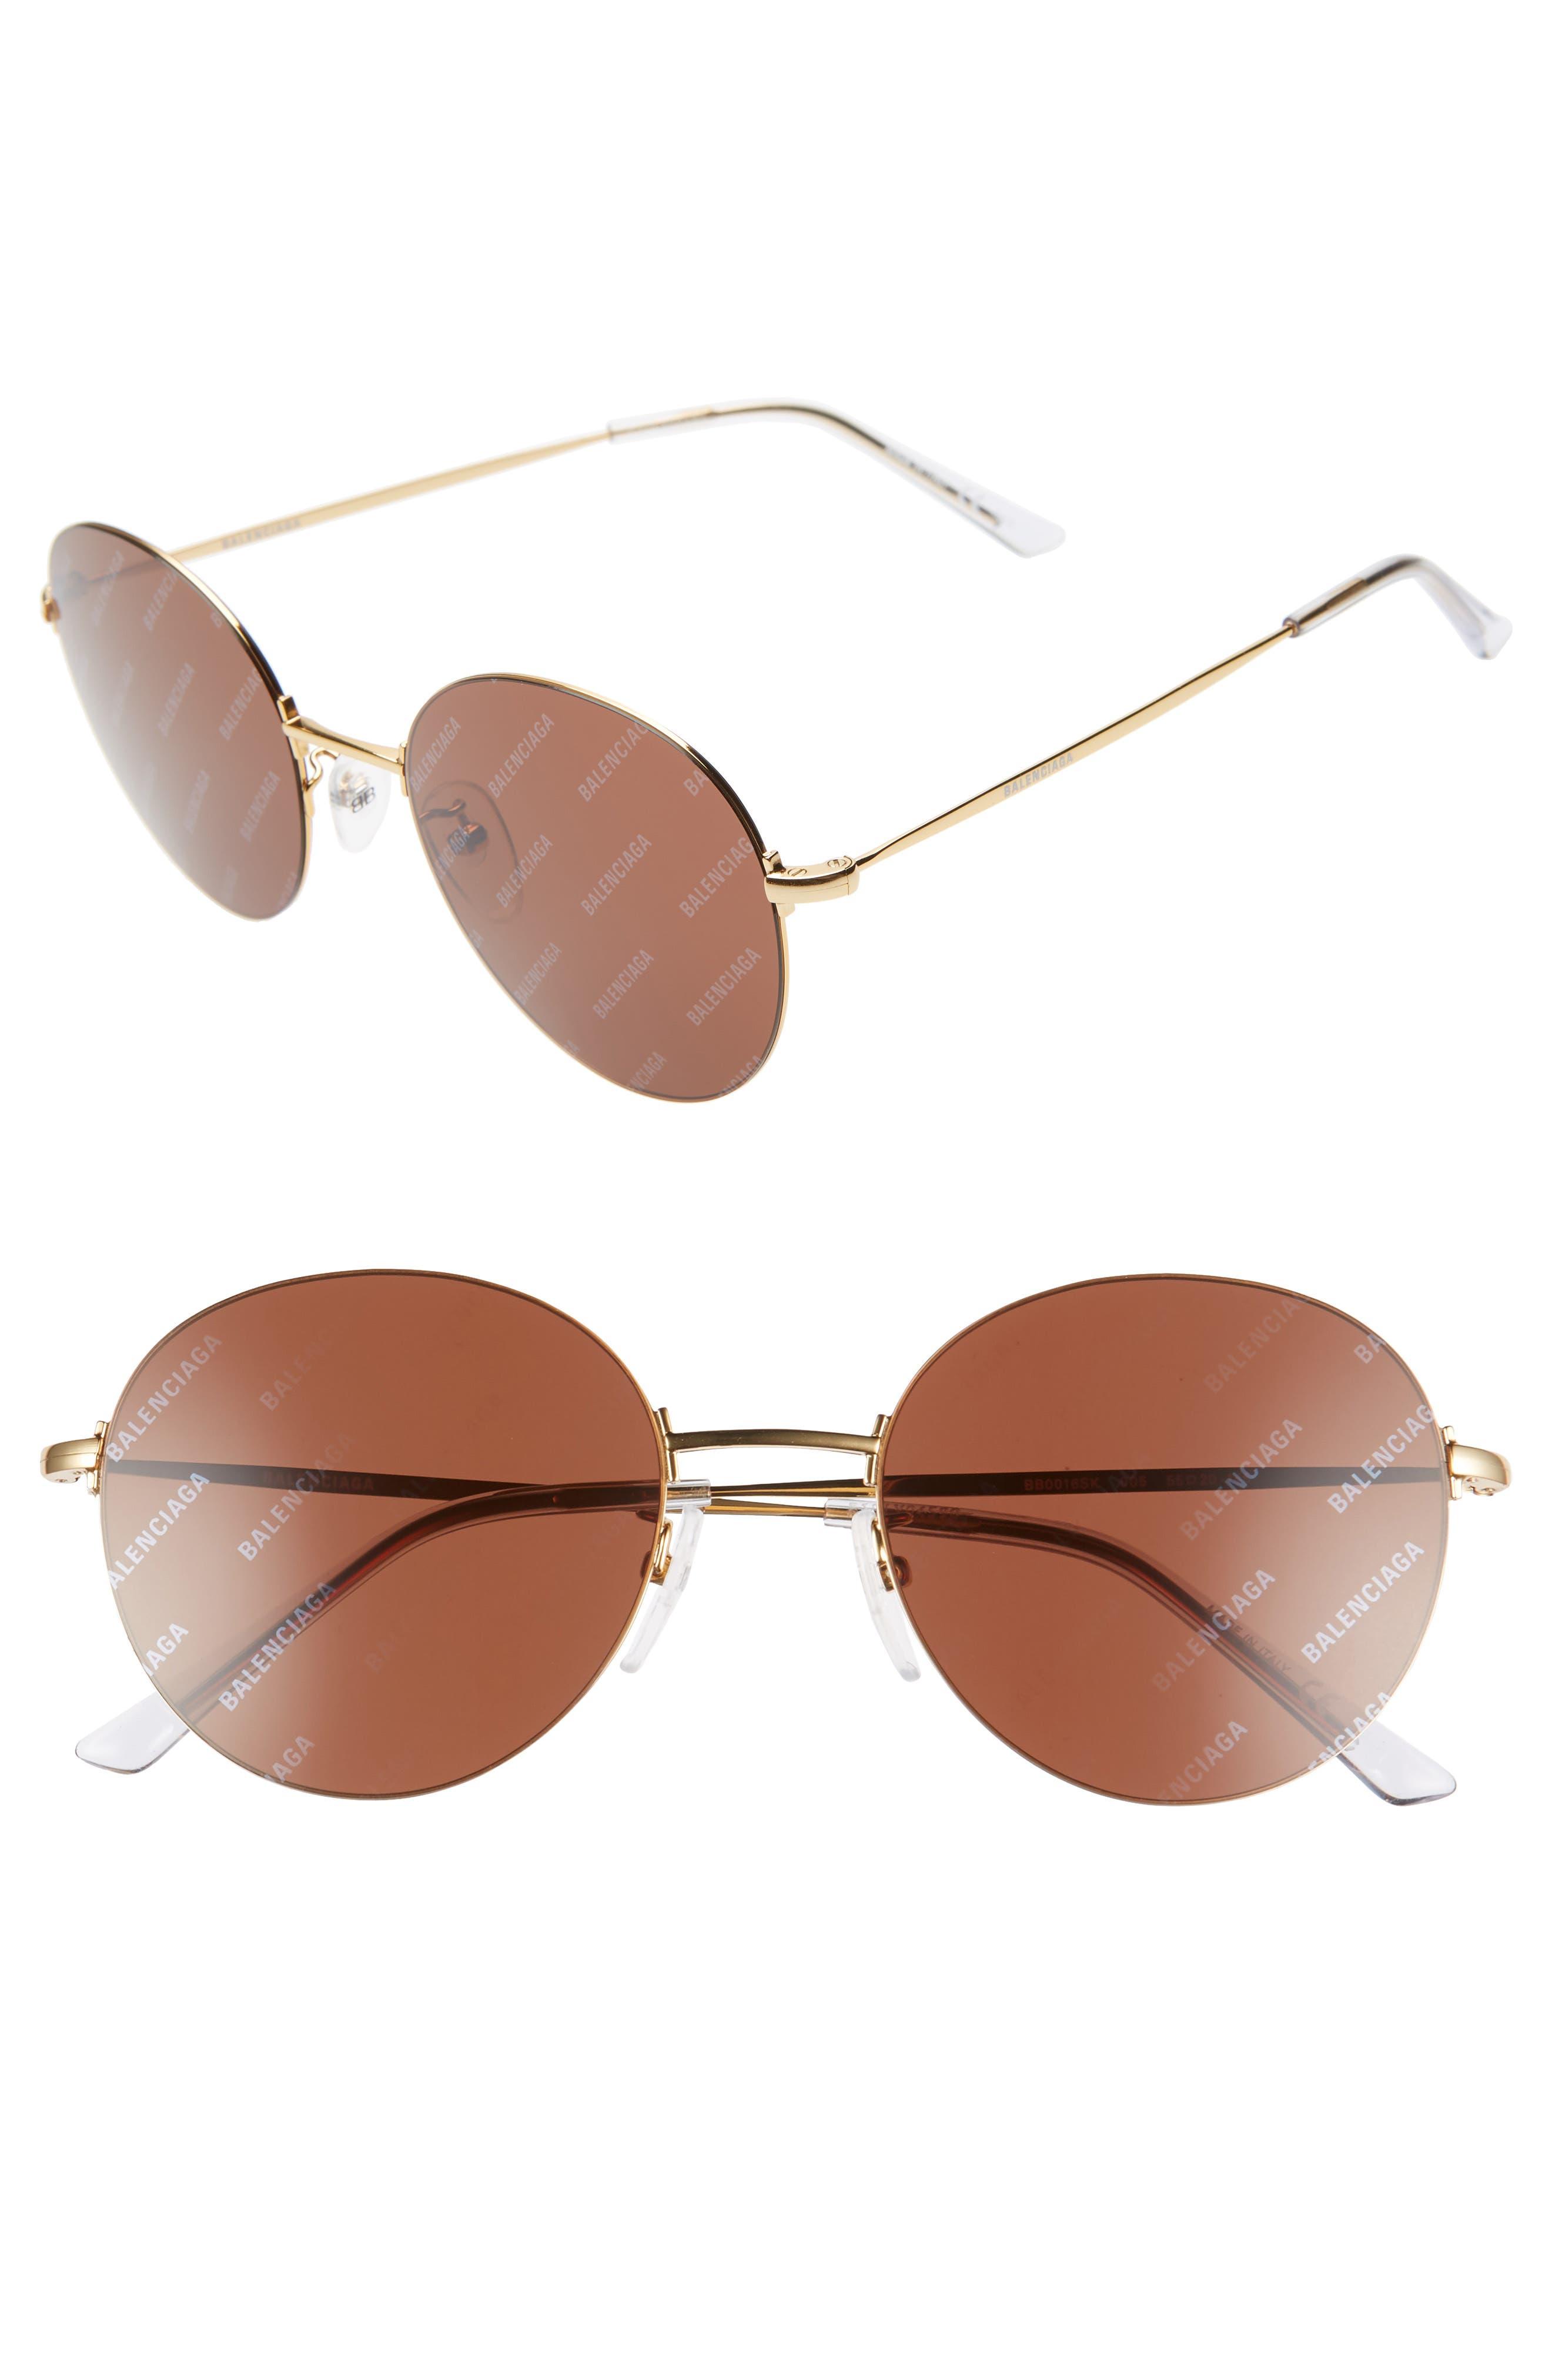 Balenciaga 55Mm Round Sunglasses - Shiny Endura Gold/ Brown